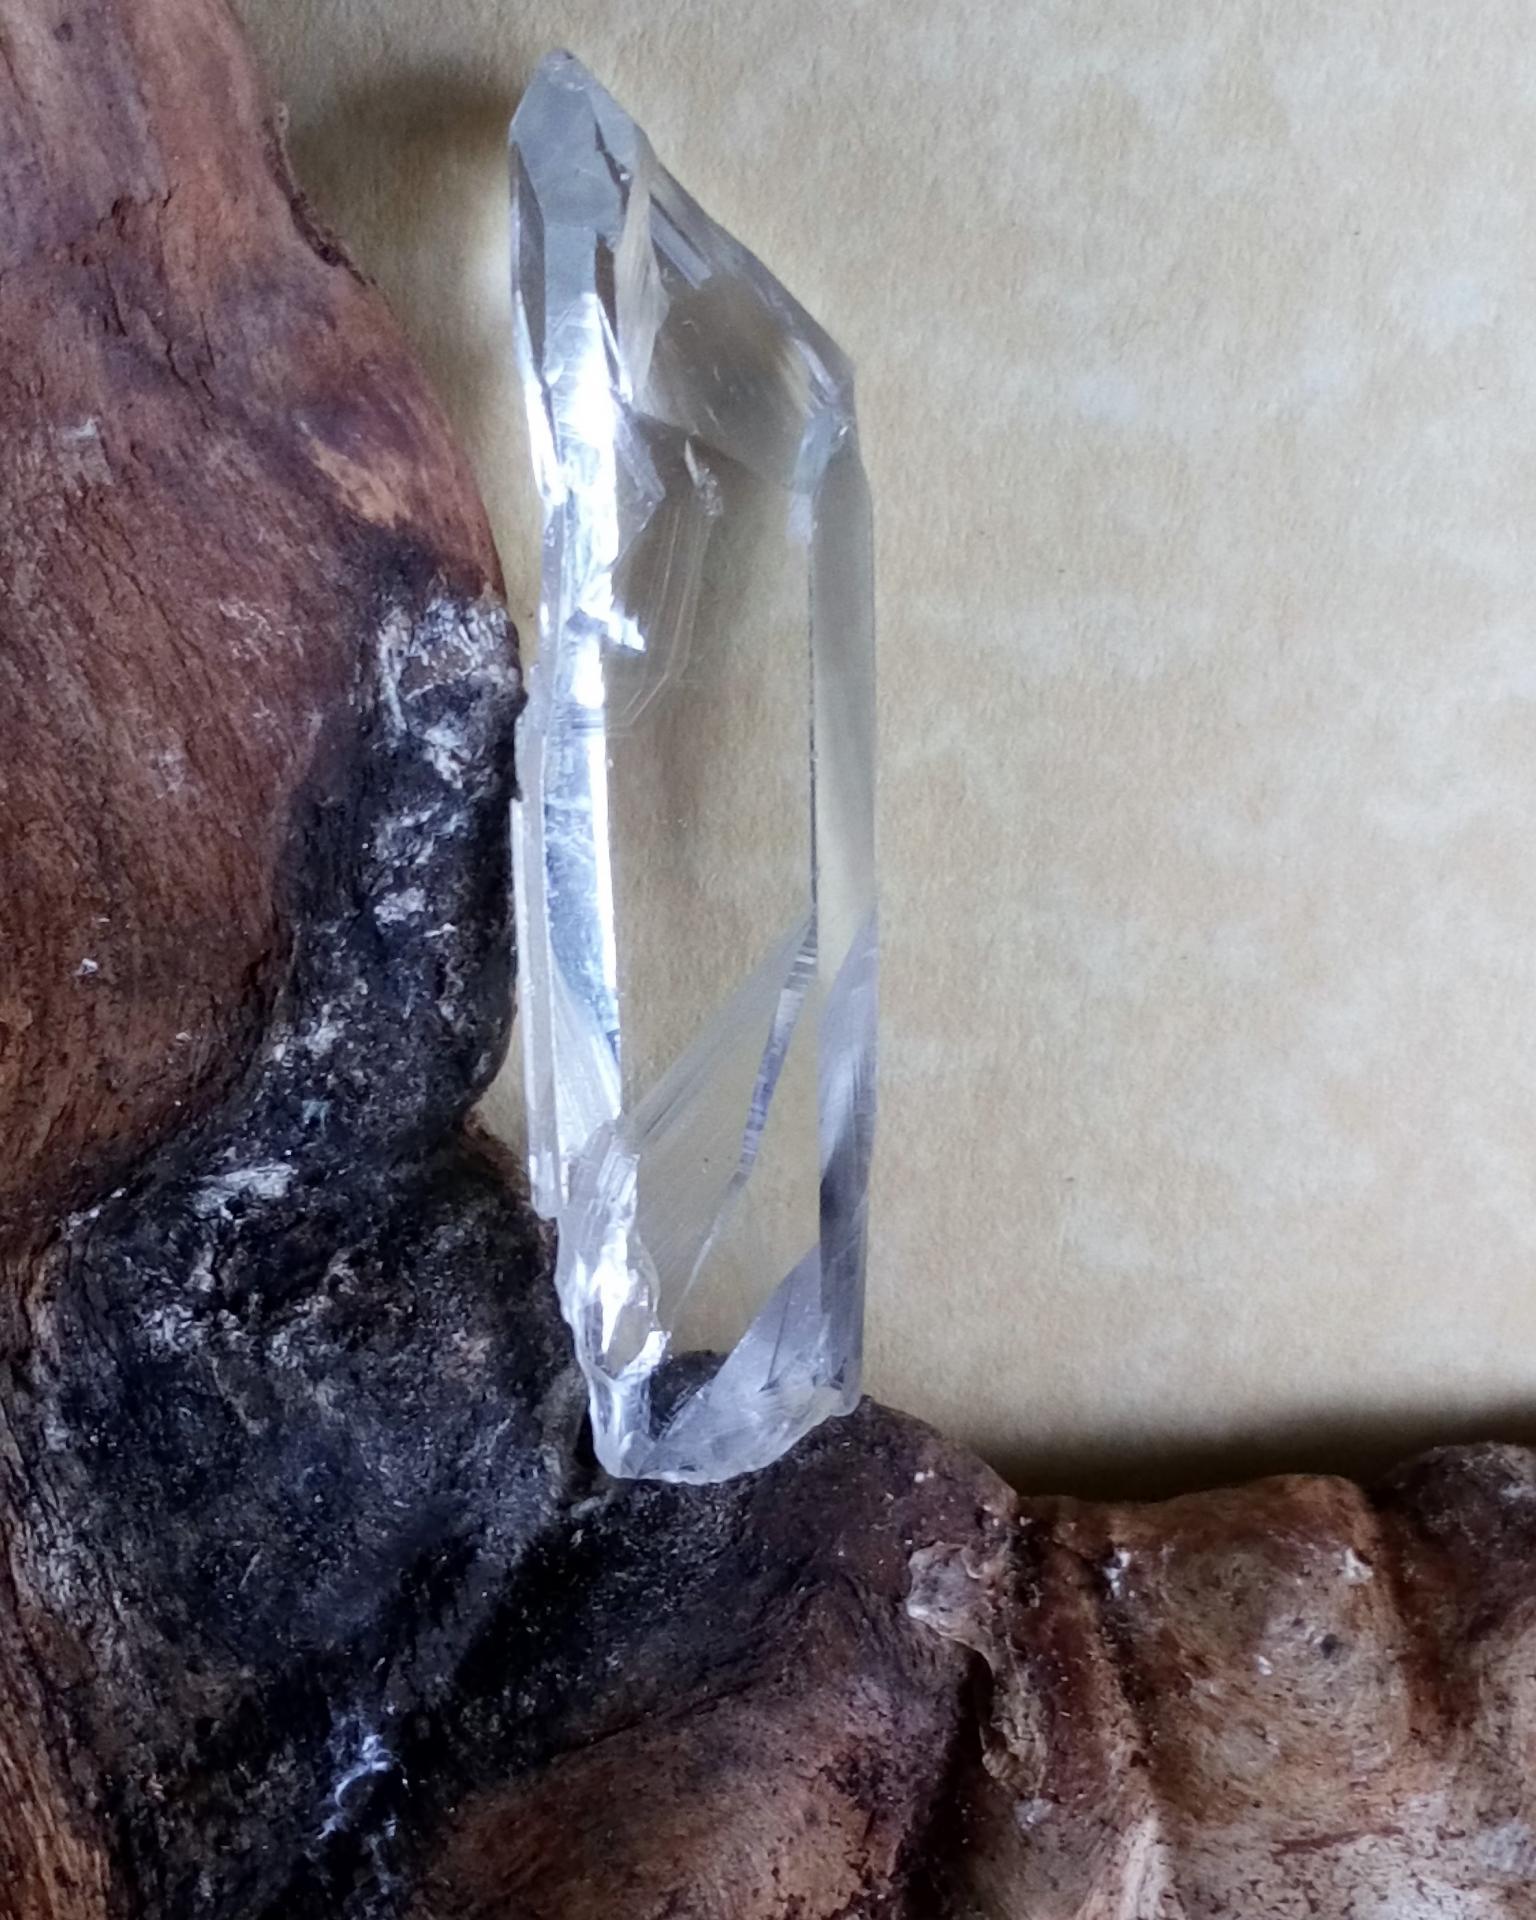 Cristal de roche mine de la guardette 2